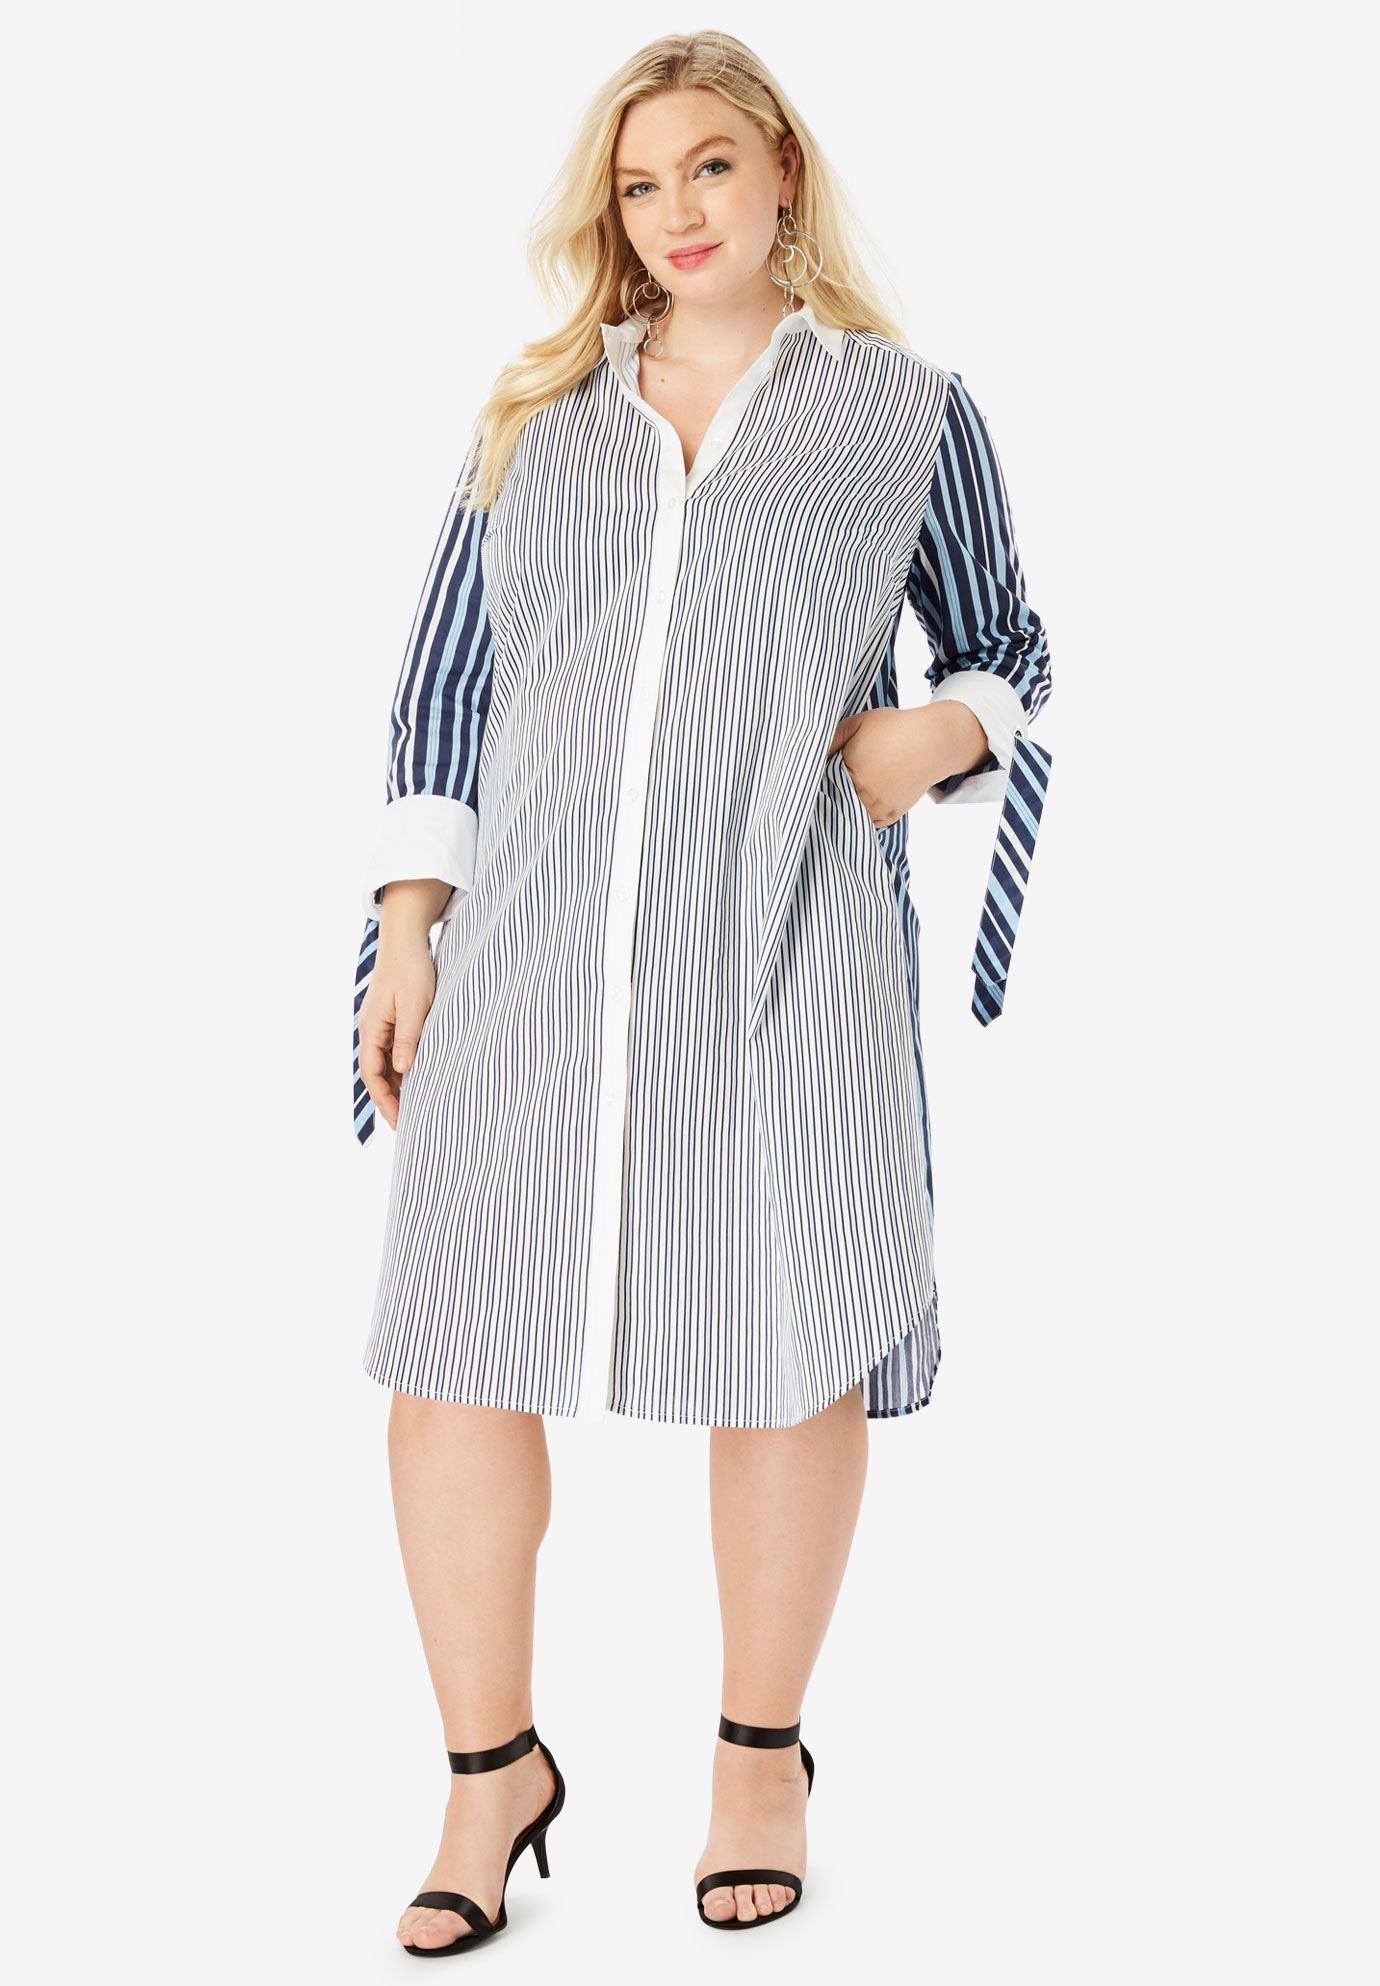 Tie-Sleeve Kate Shirtdress